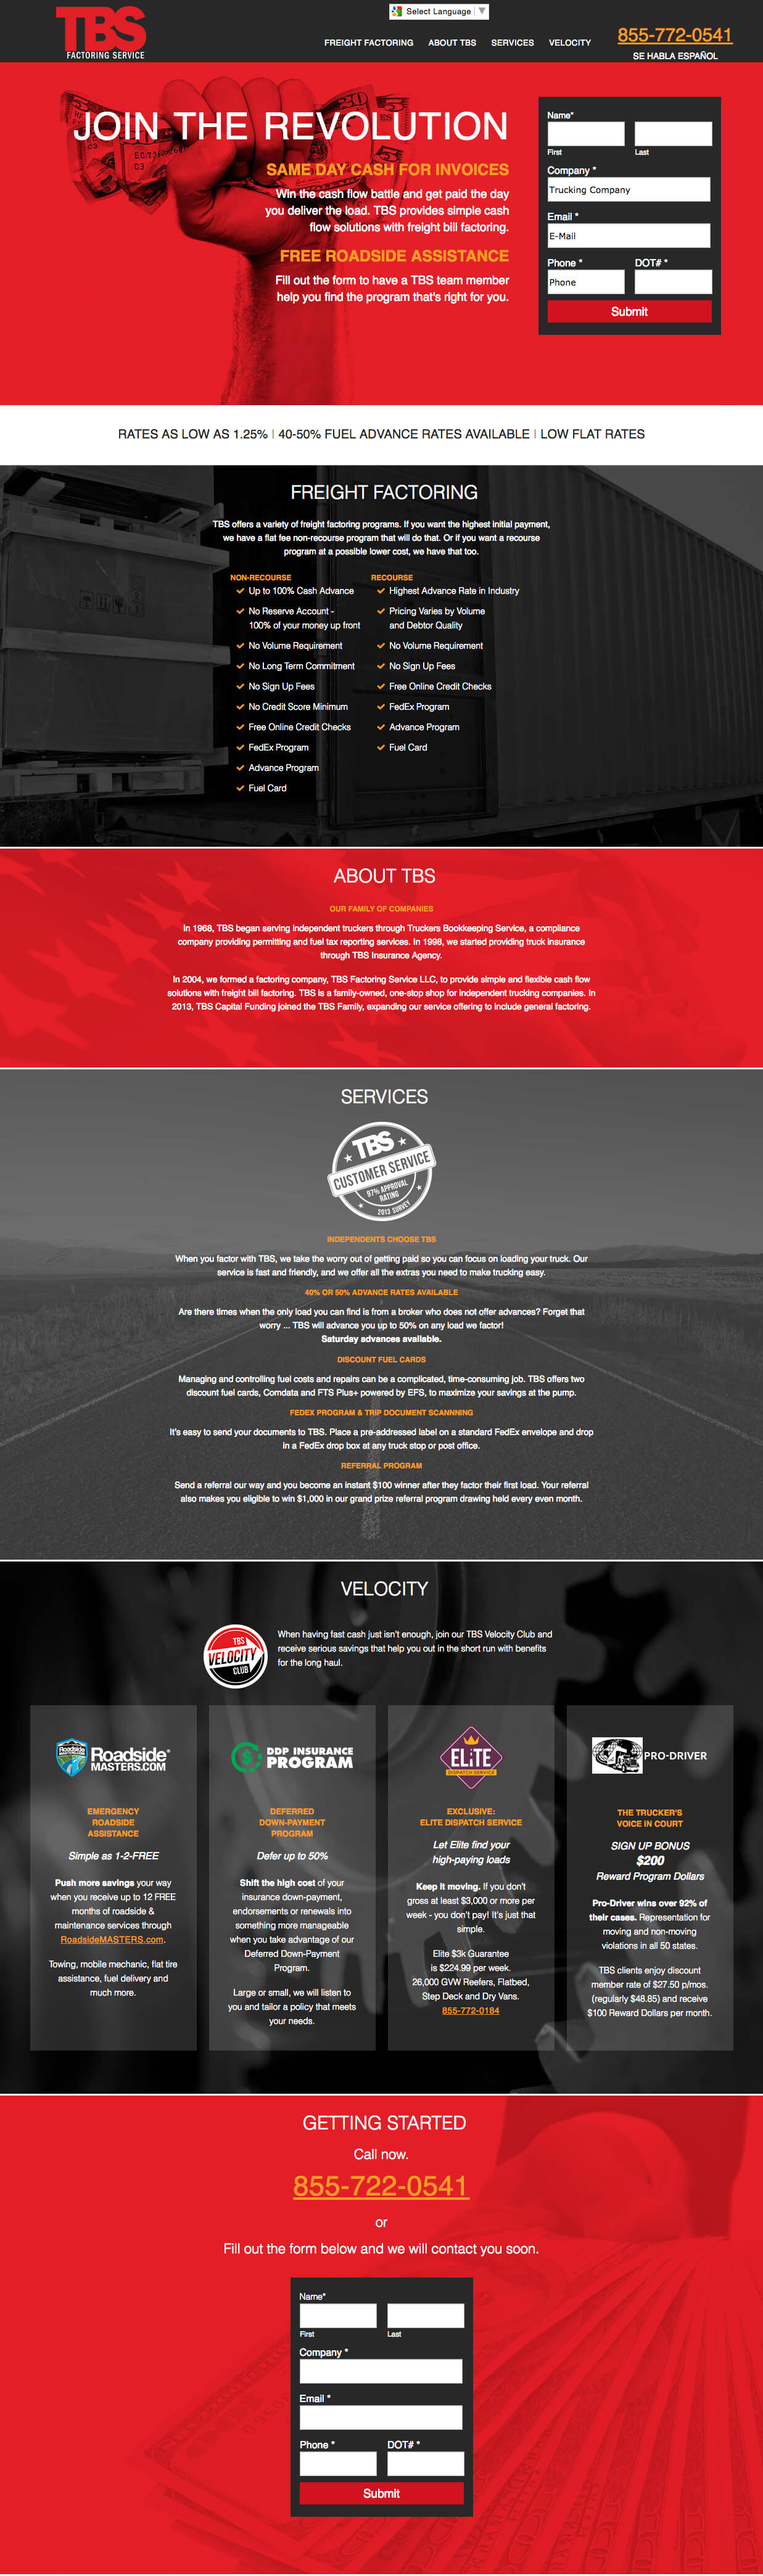 trucking landing page design example